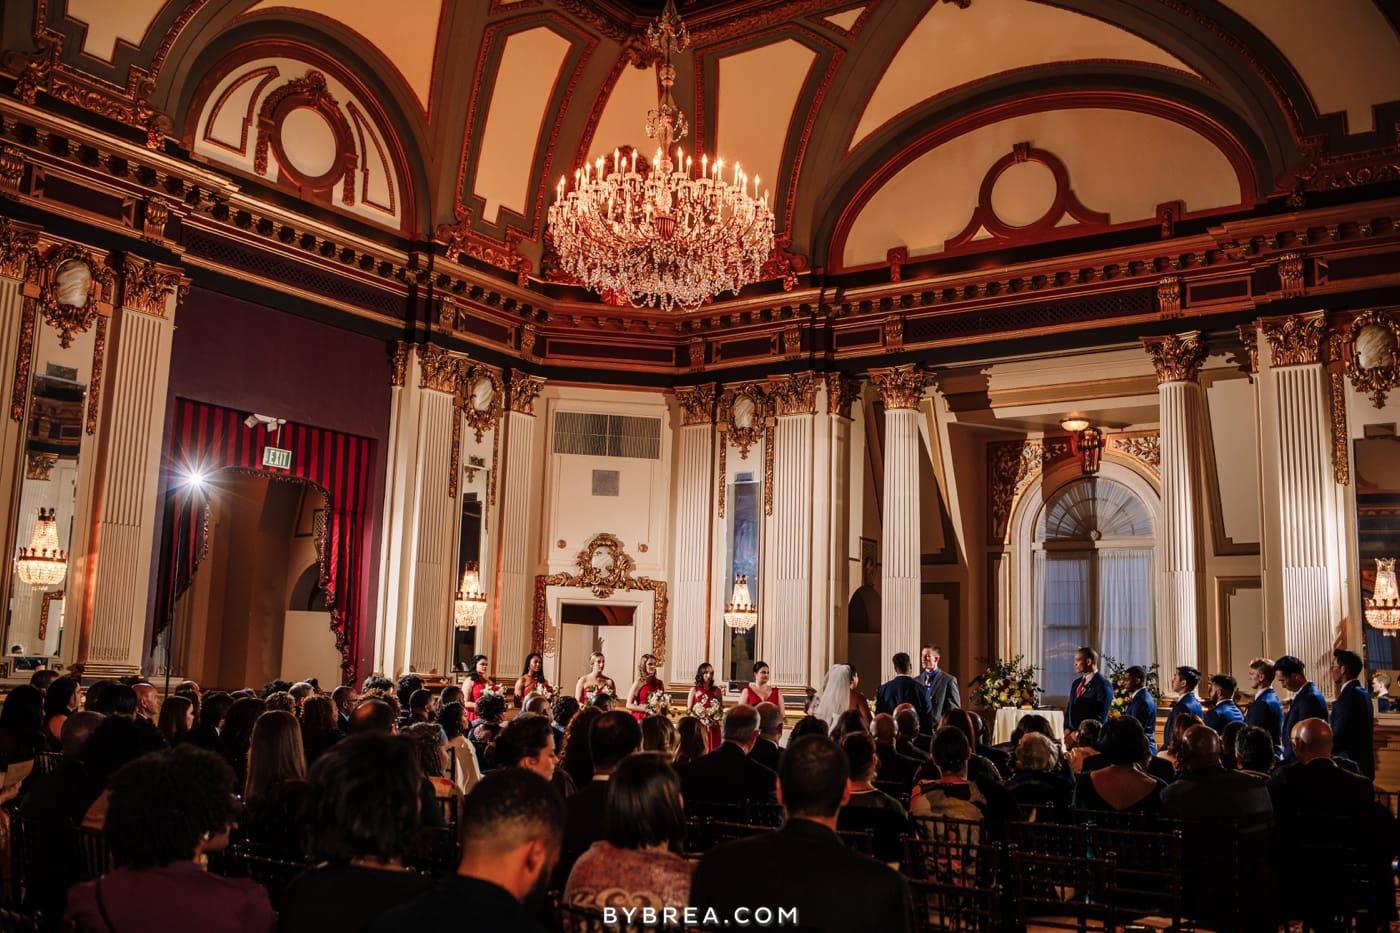 dani-bryce-winter-belvedere-baltimore-wedding-photos_0049